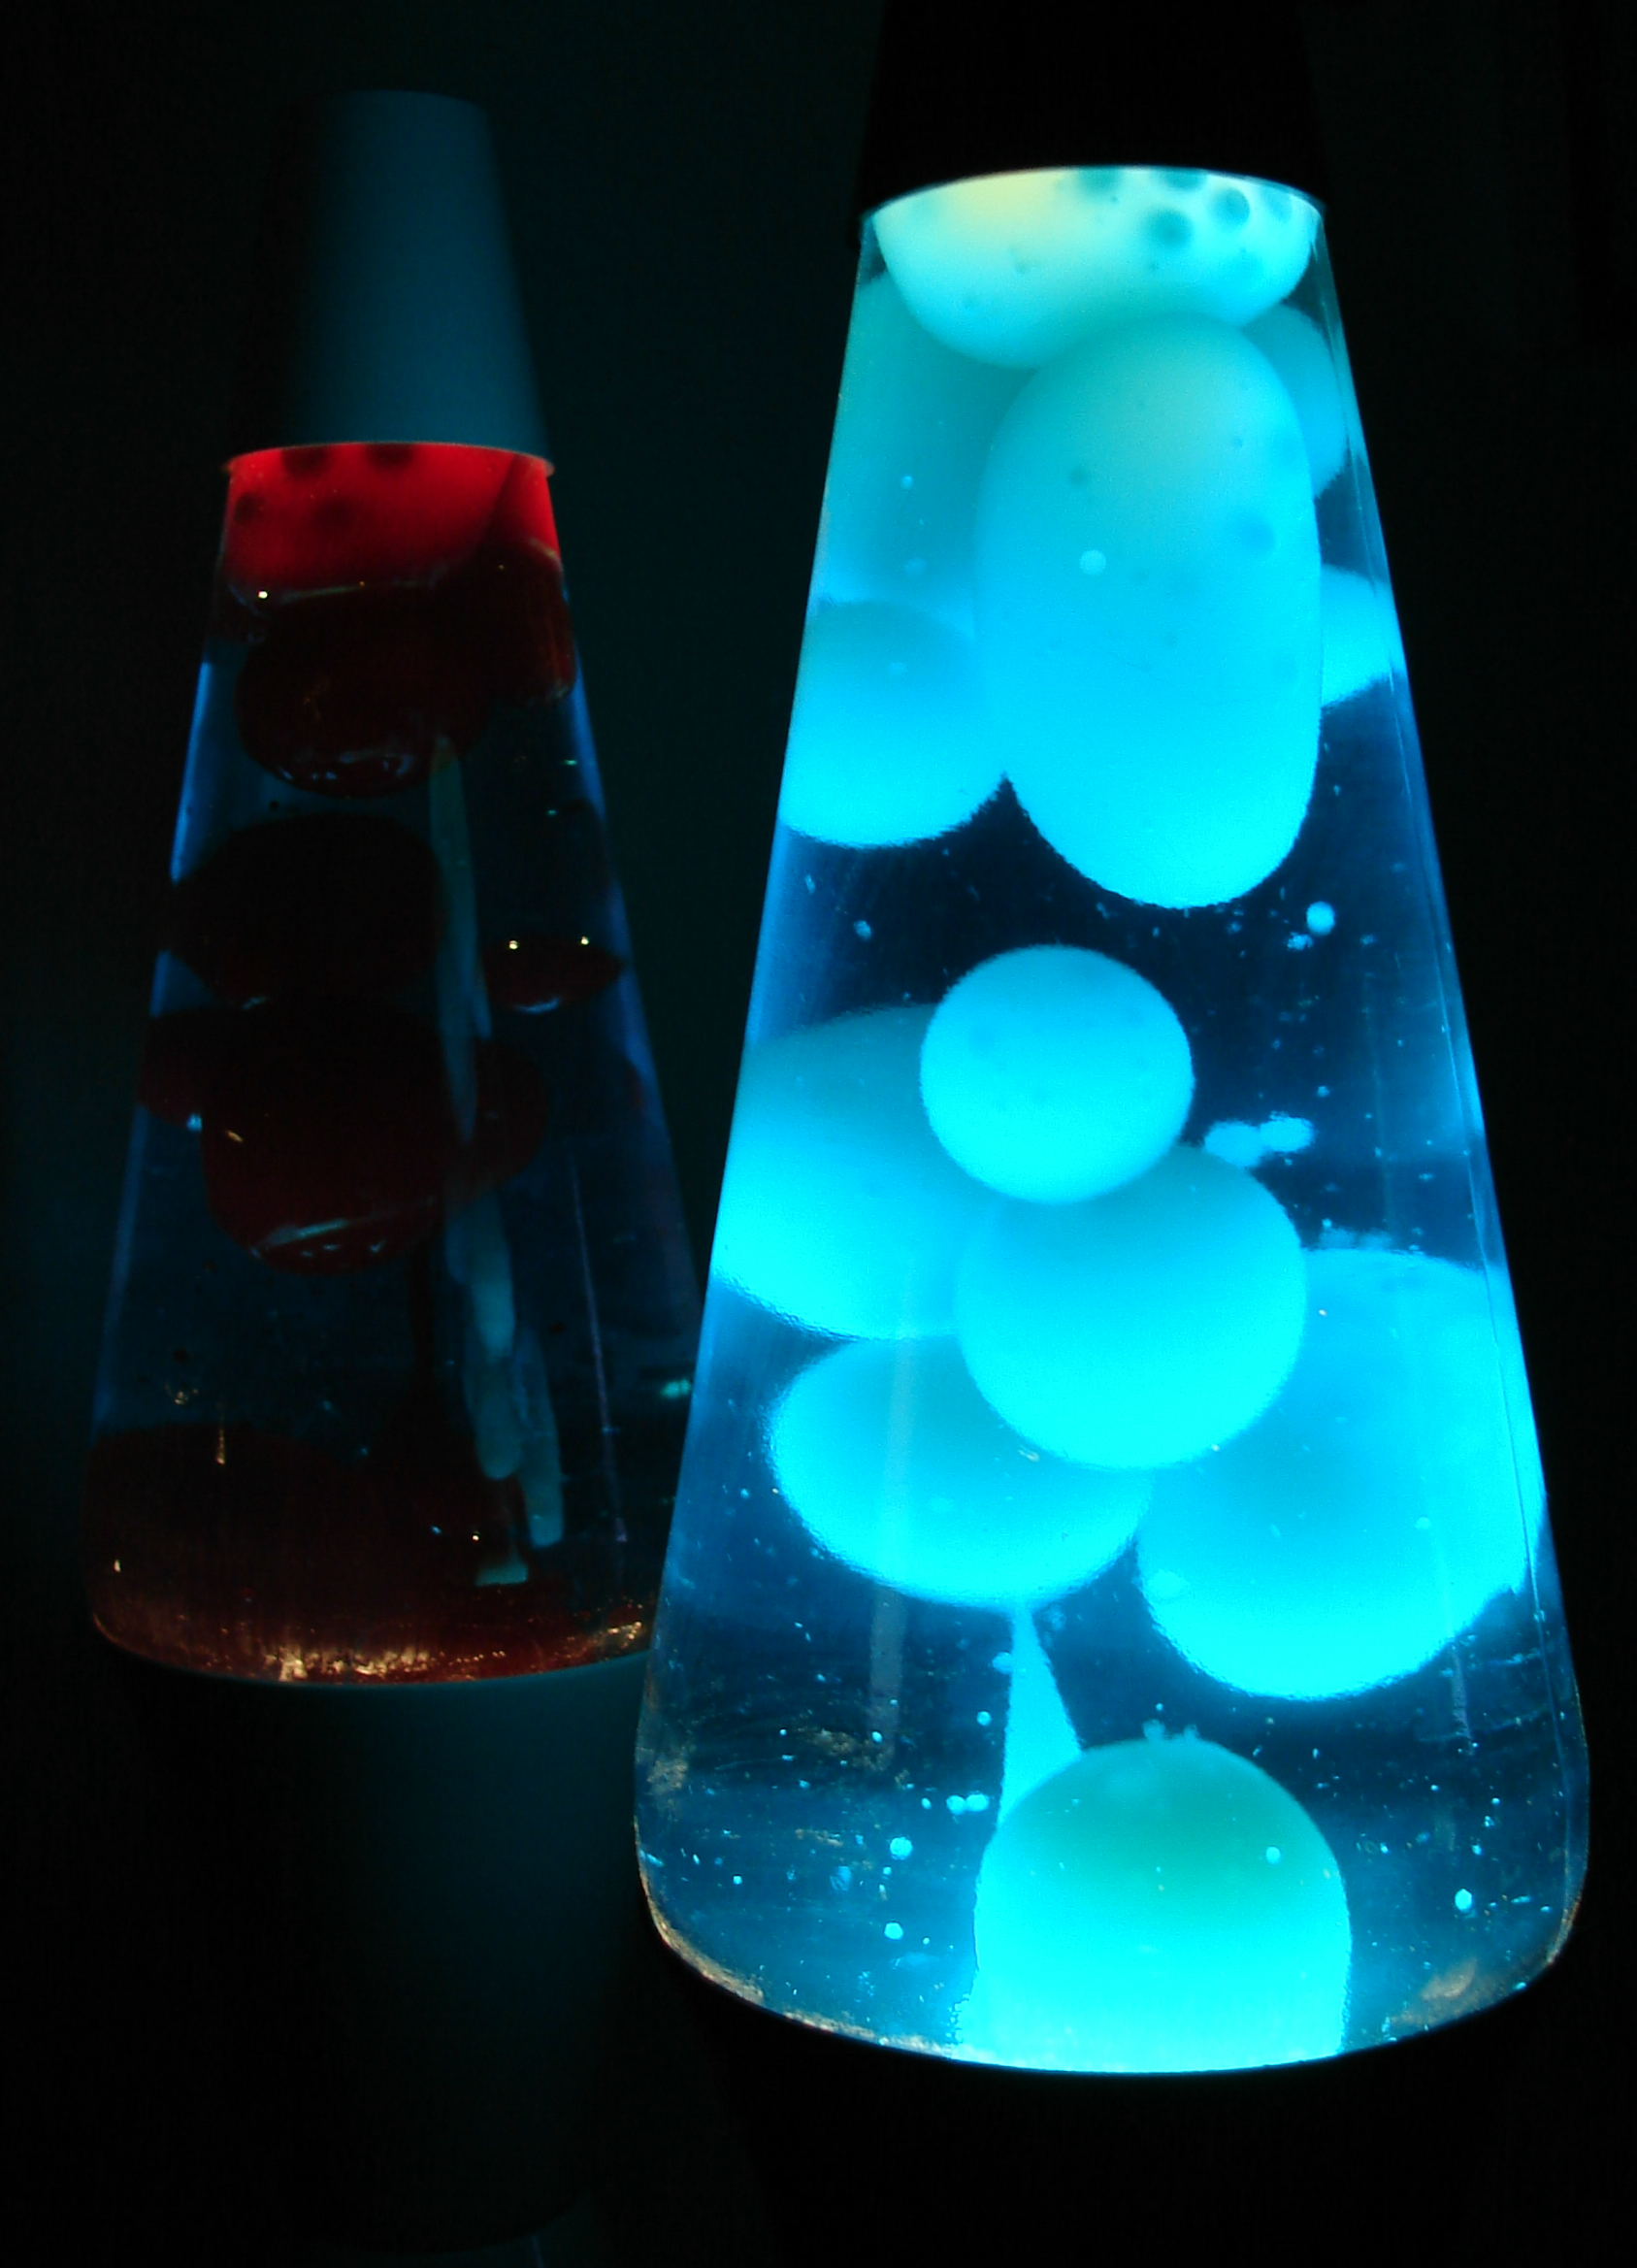 Led Lava Lamp 10 Points Of Interest Over Radiant